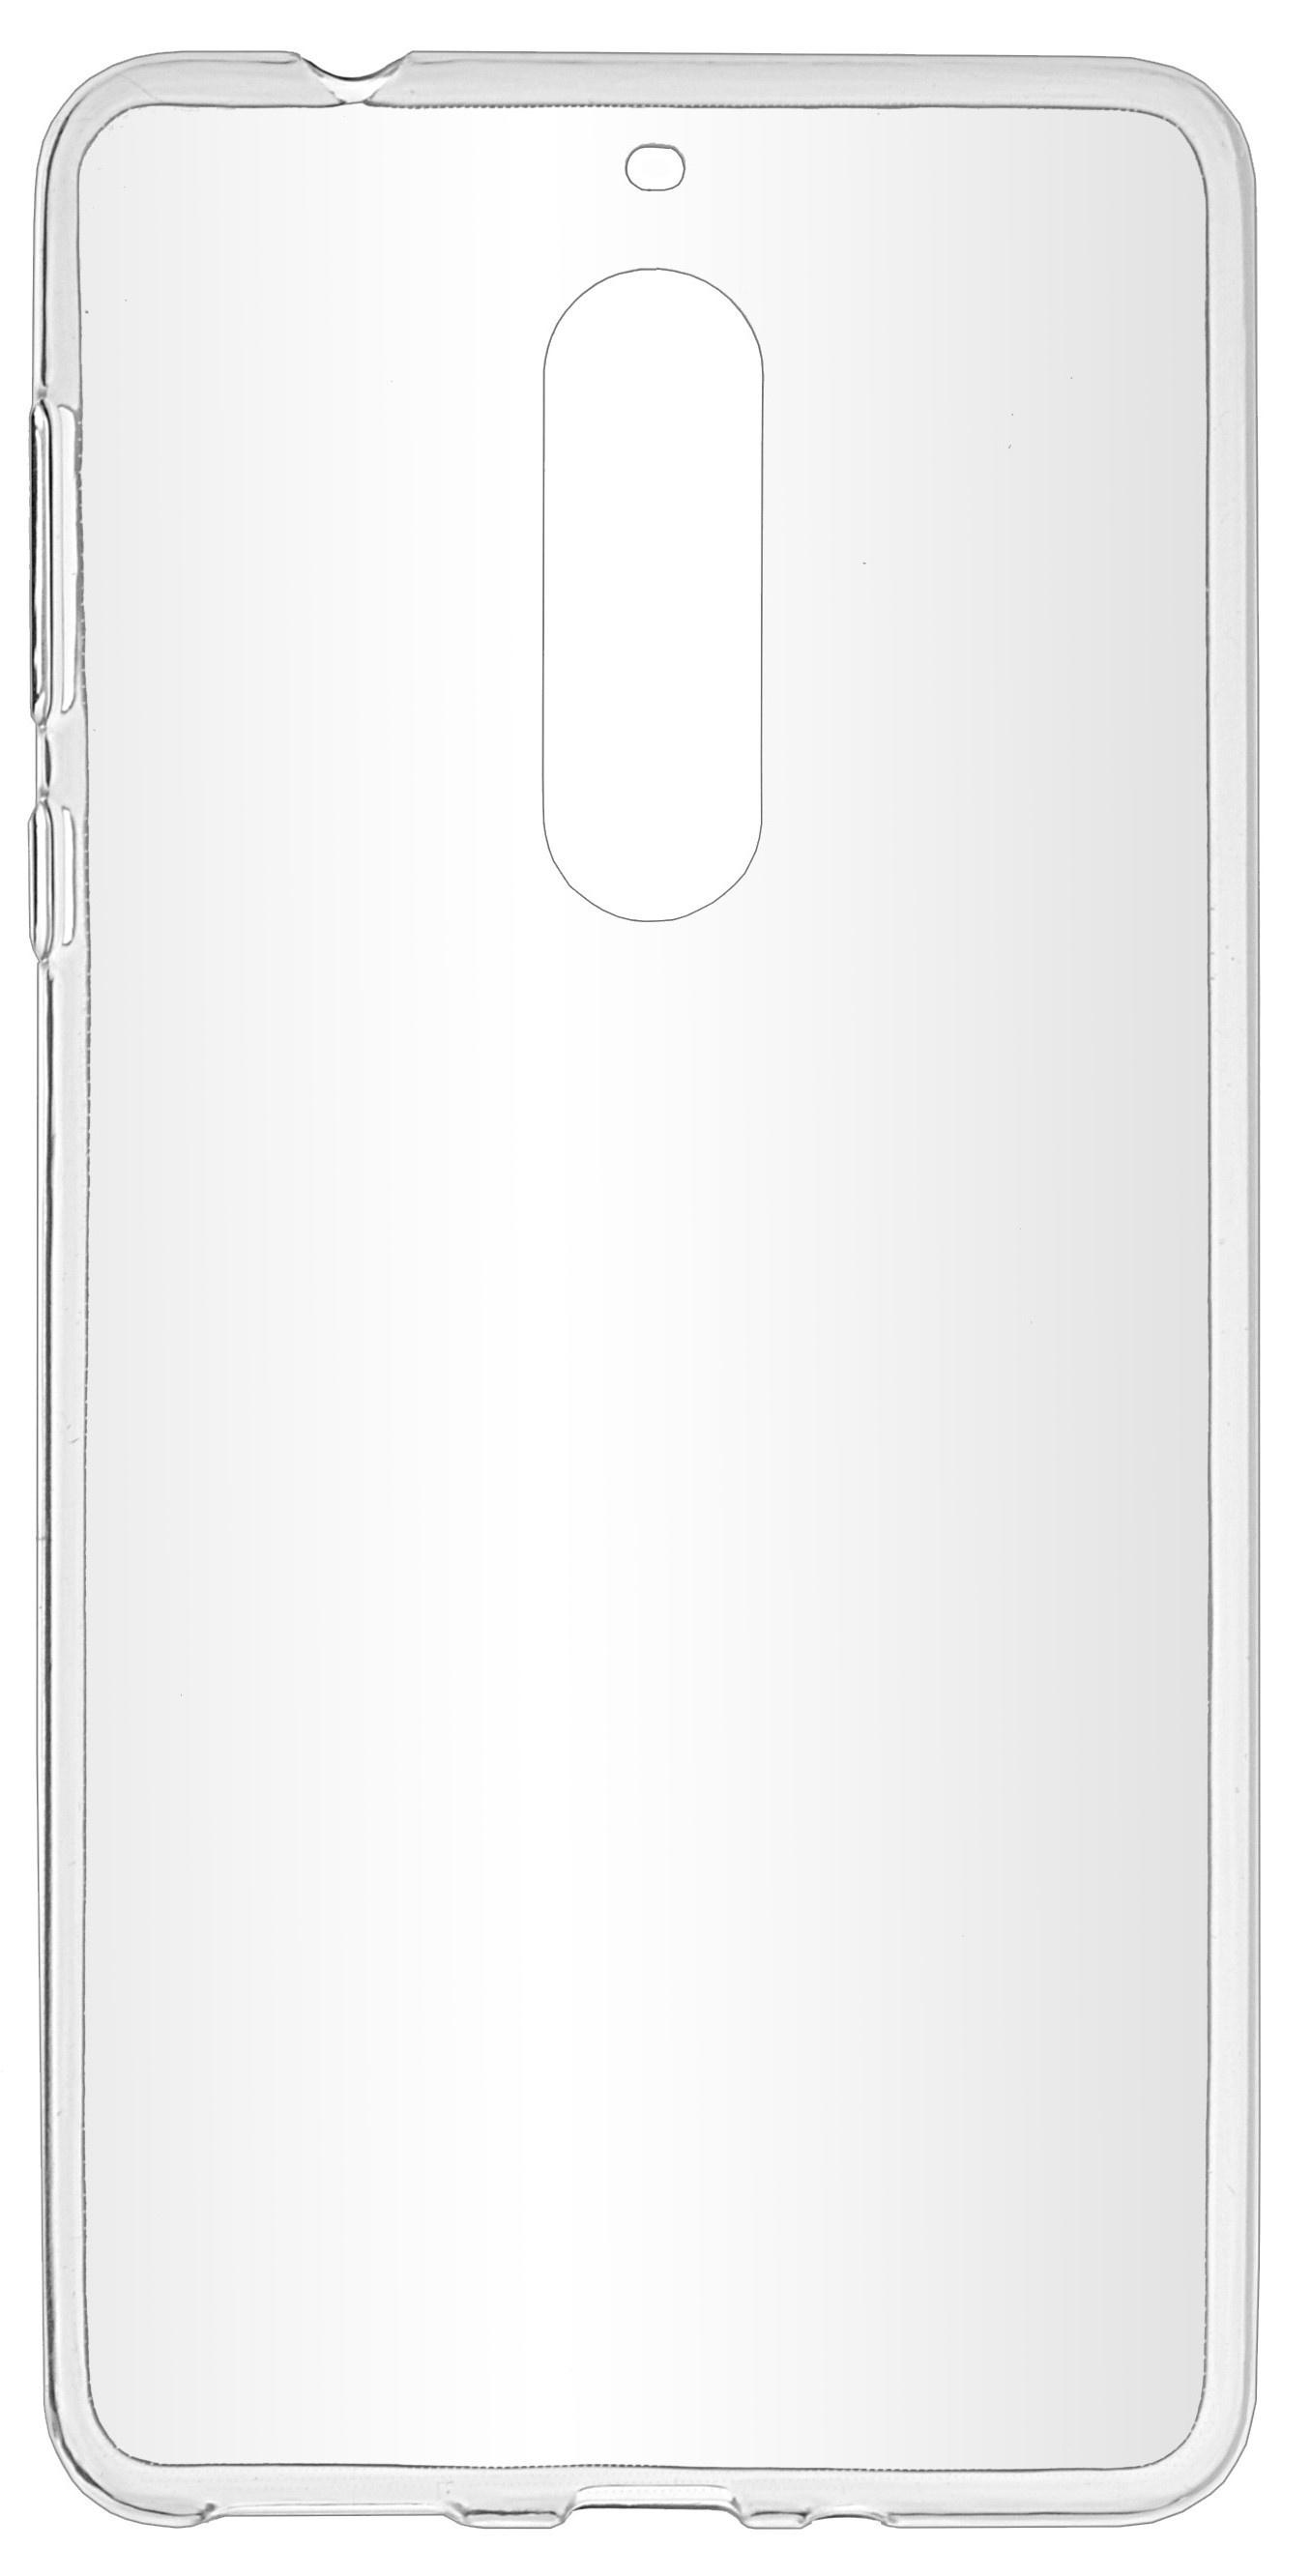 Чехол для сотового телефона skinBOX Slim Silicone, 4660041408904, прозрачный цена и фото